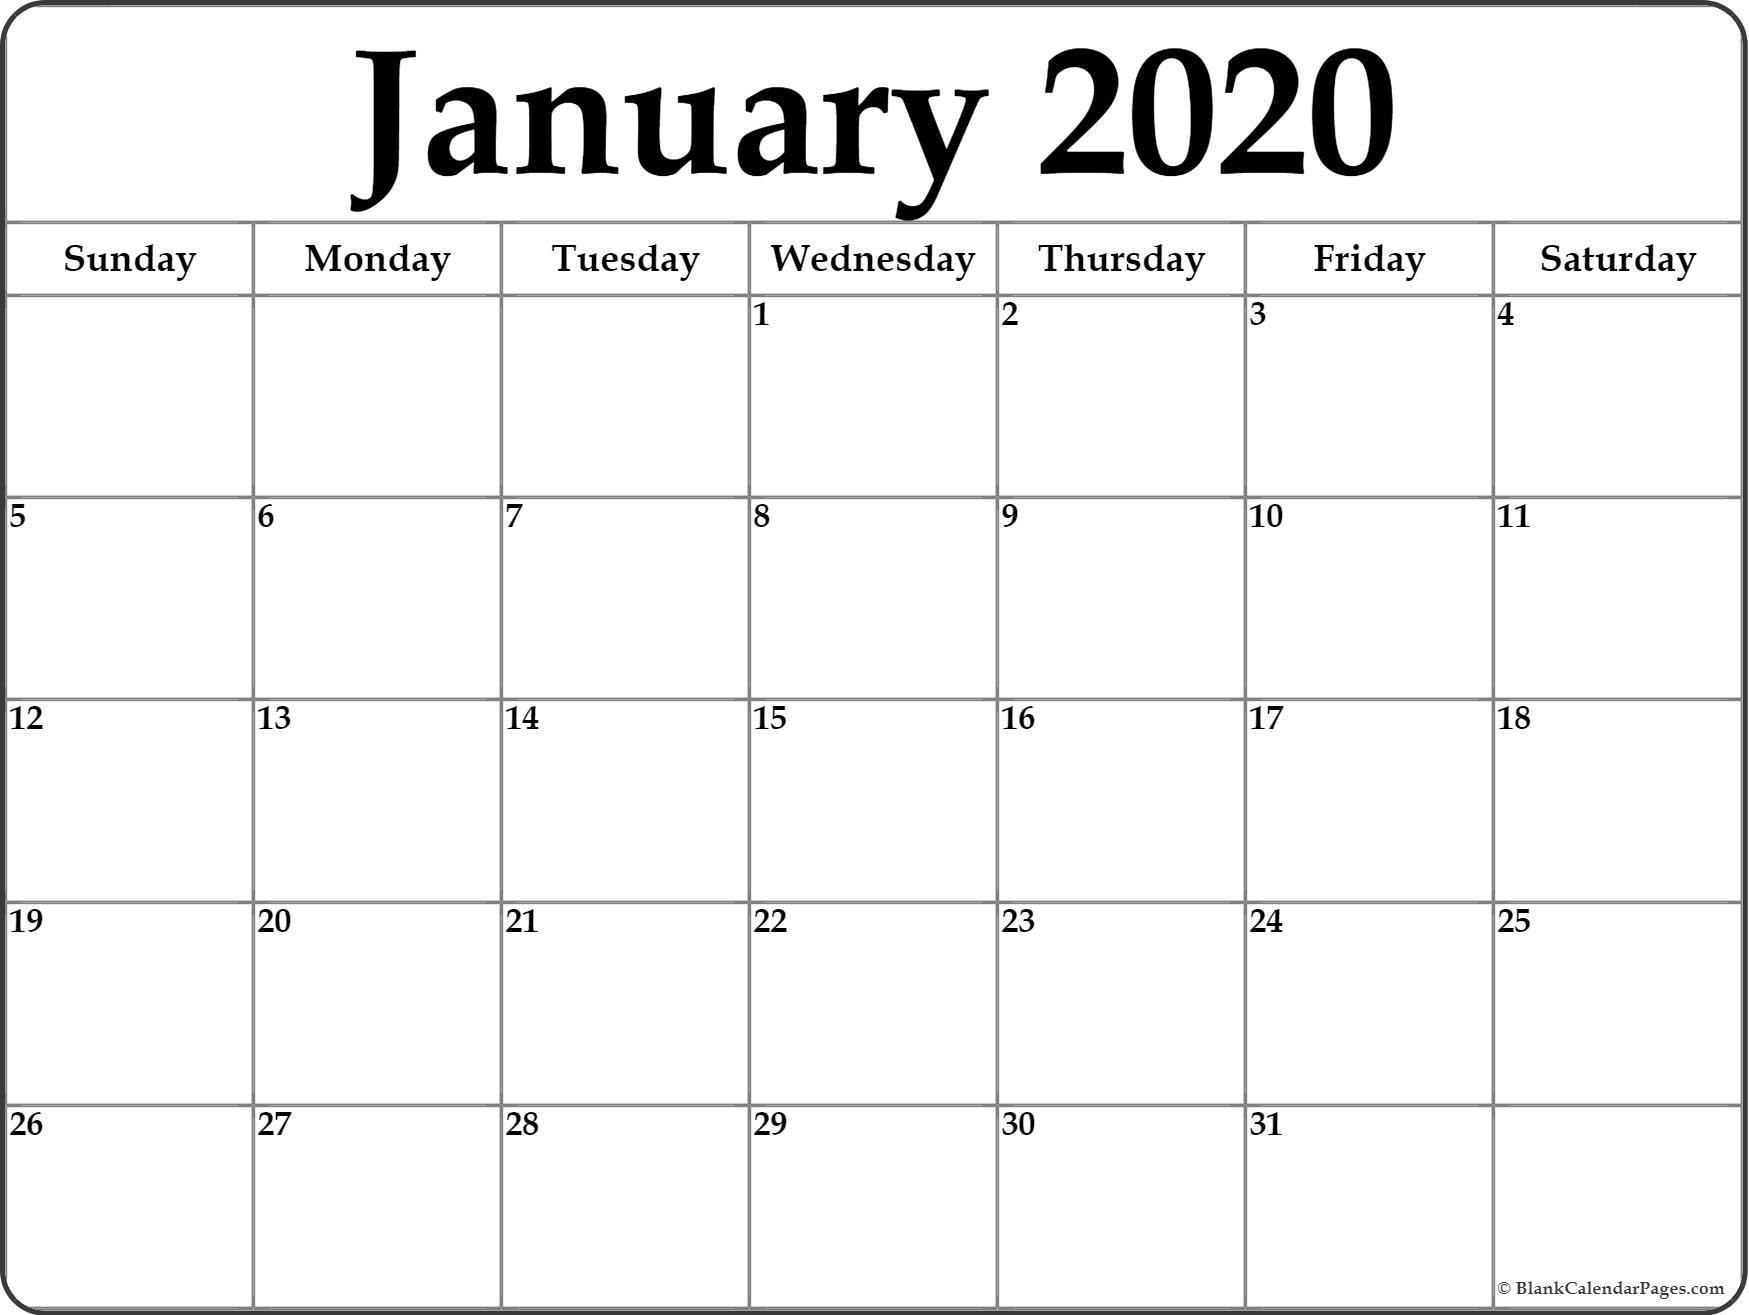 Monthly 2020 Calendar Printable January 2020 Blank Calendar intended for Large Blank Monthly Calendars January Printable